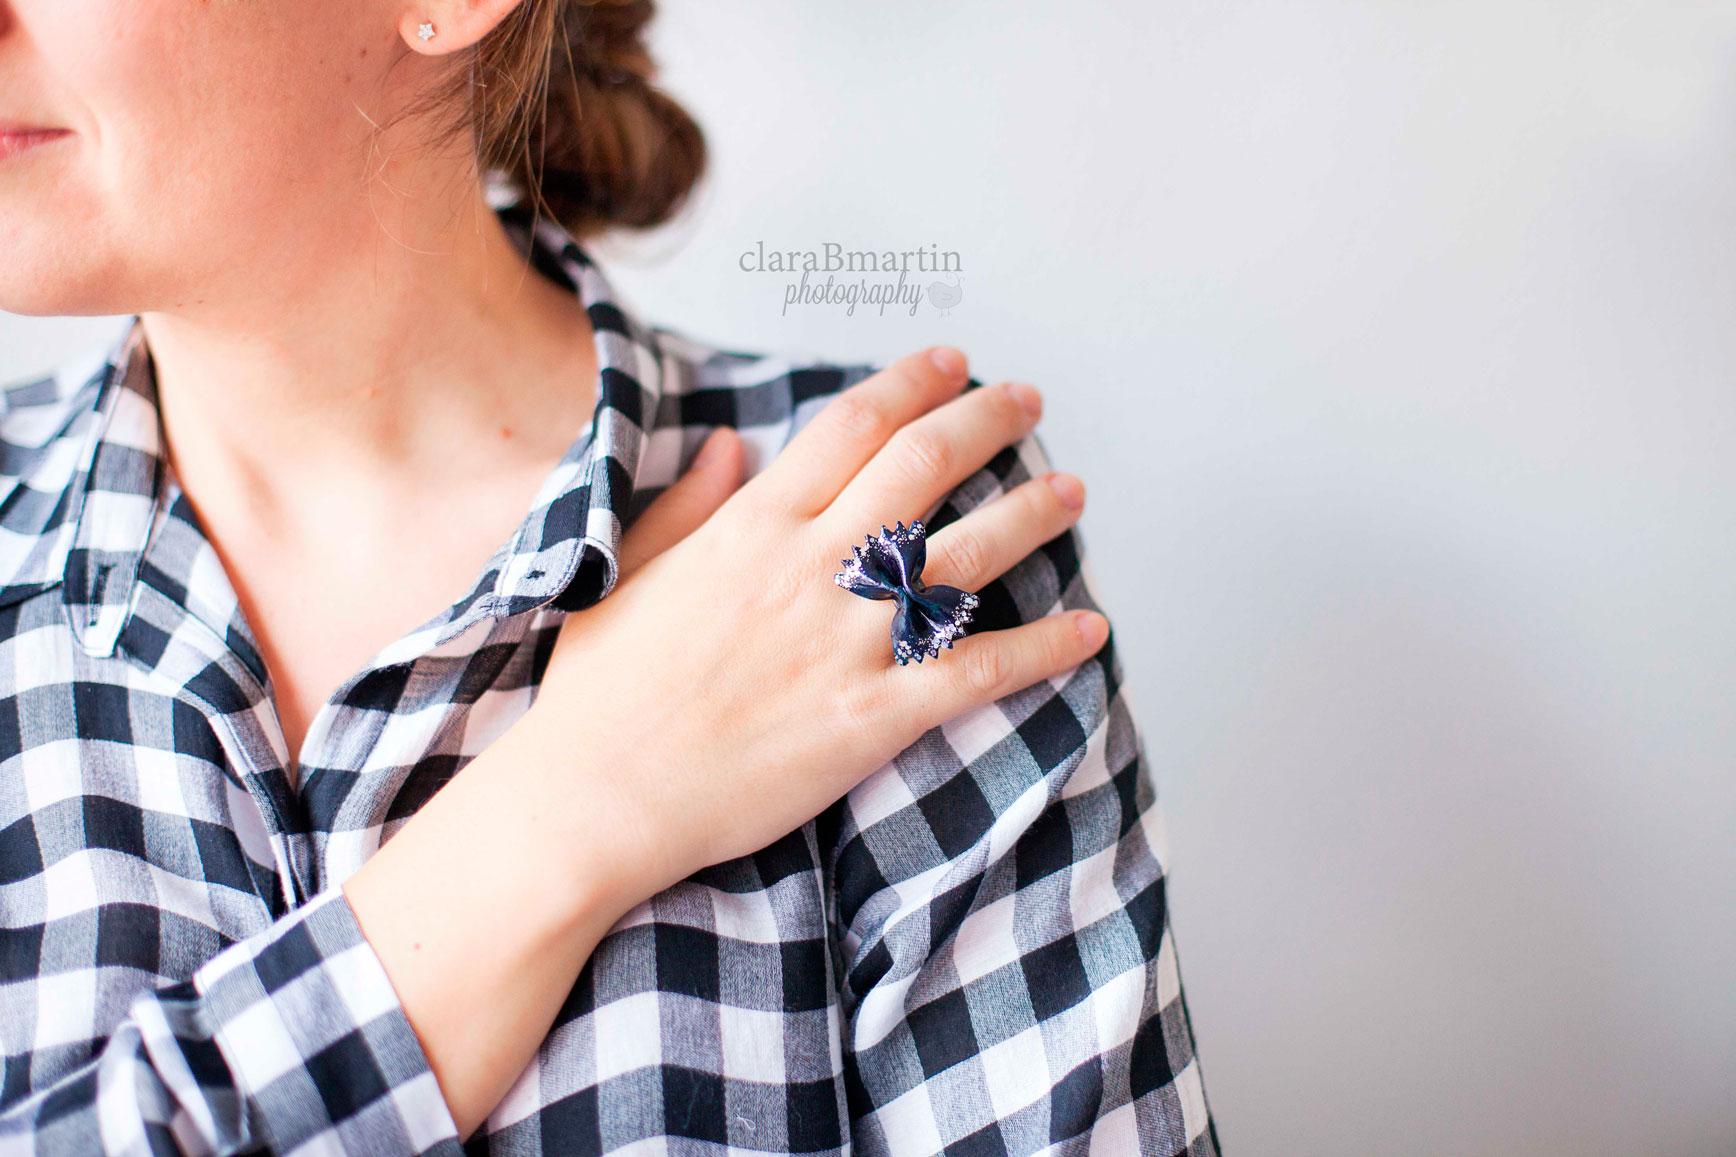 Lace Rings DIY_claraBmartin09